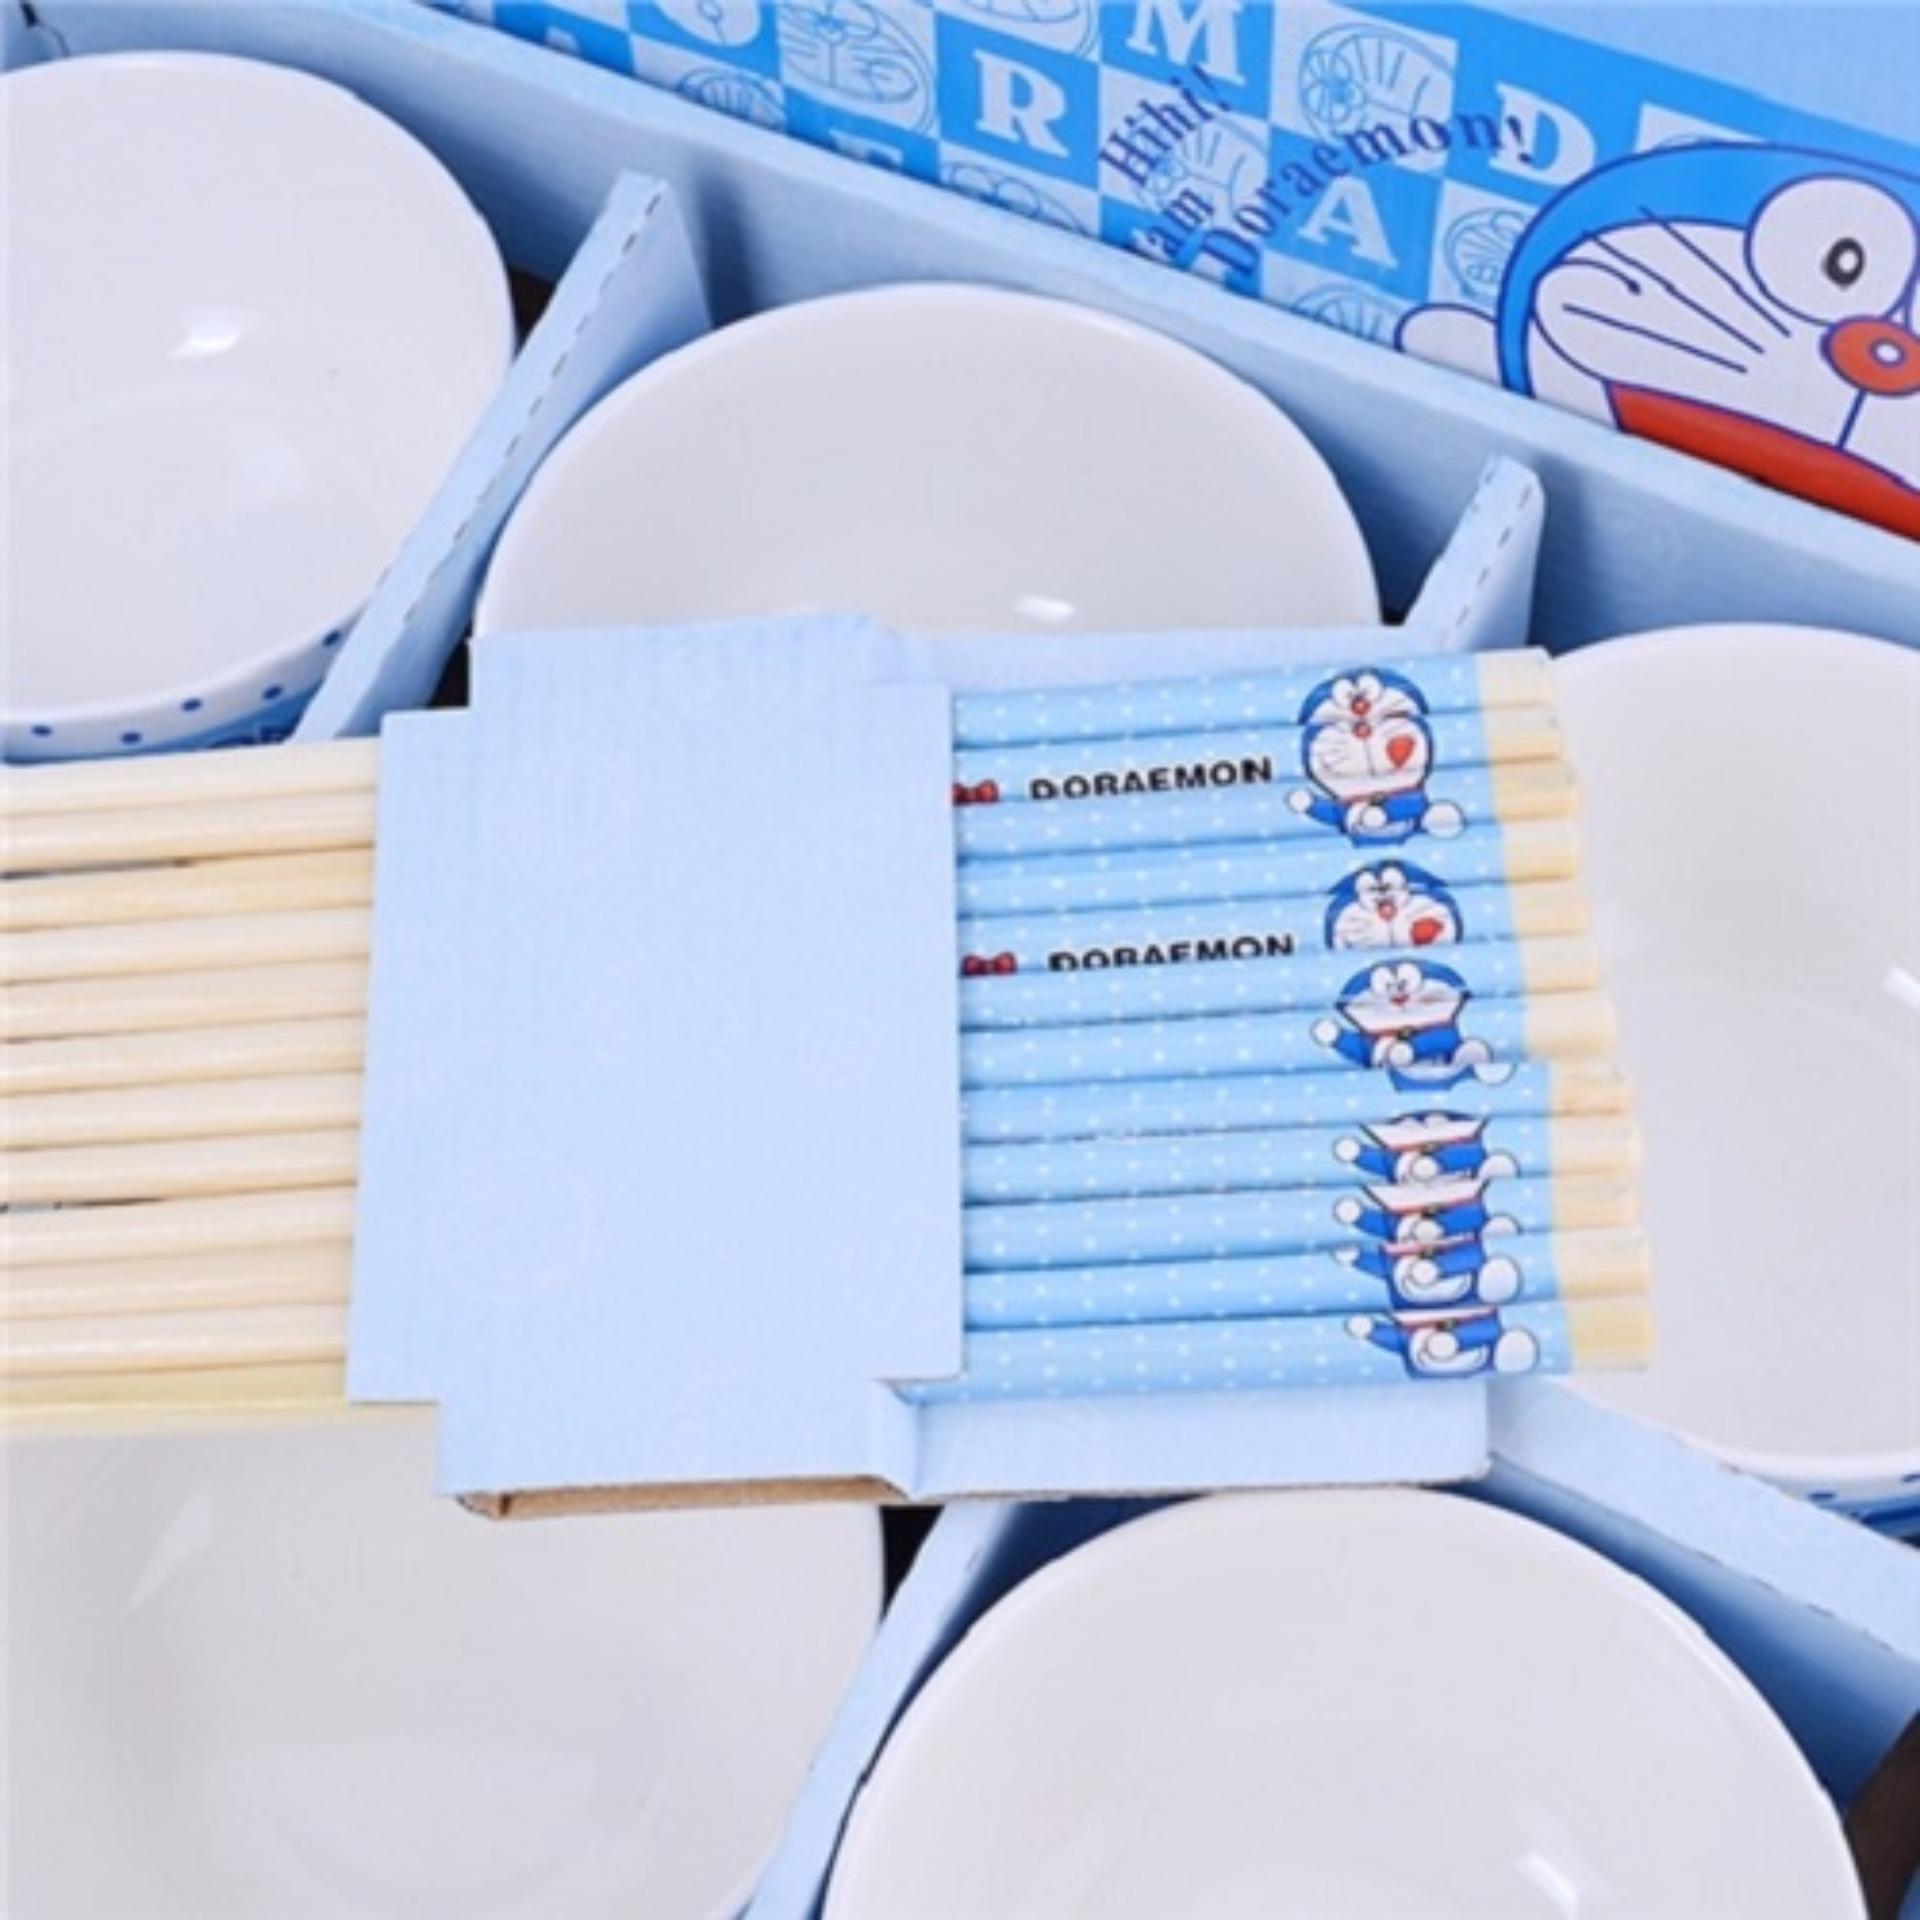 Bộ chén đũa Hello Kitty Doraemon (Hồng)